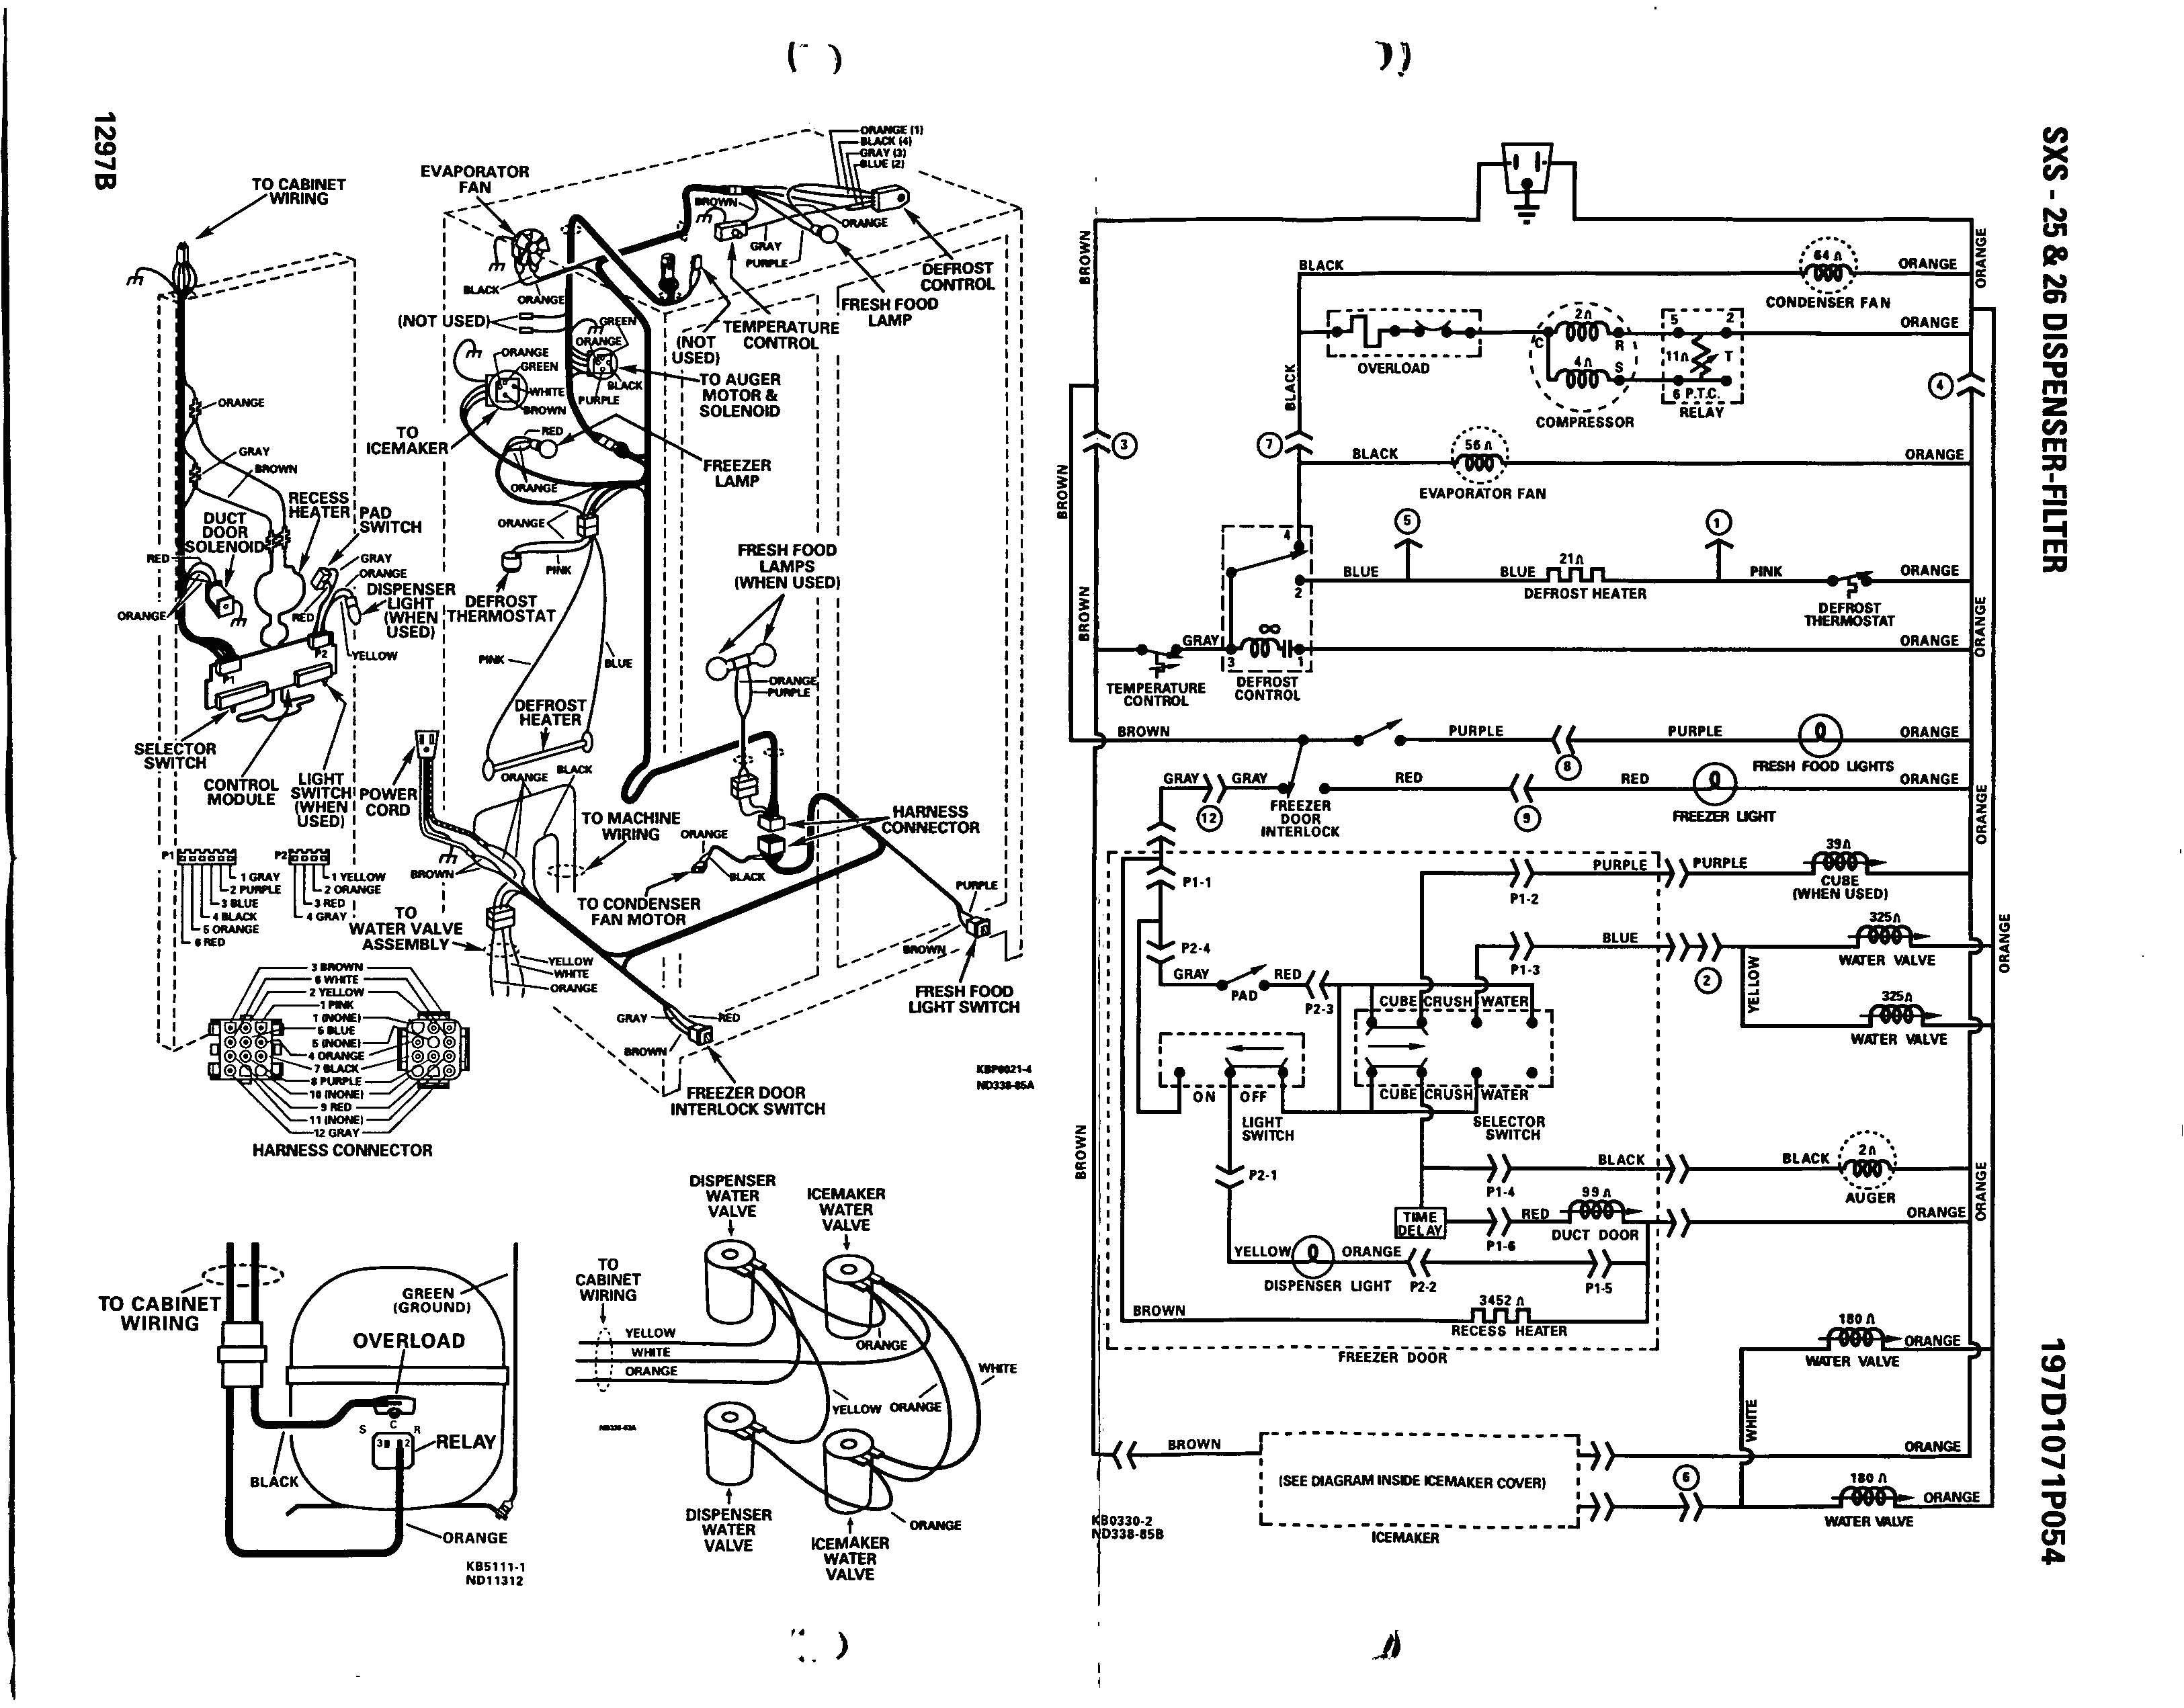 model gts18hcmerww wiring diagram wiring schematic 2019 model gts18hcmerww refrigerator wiring diagram